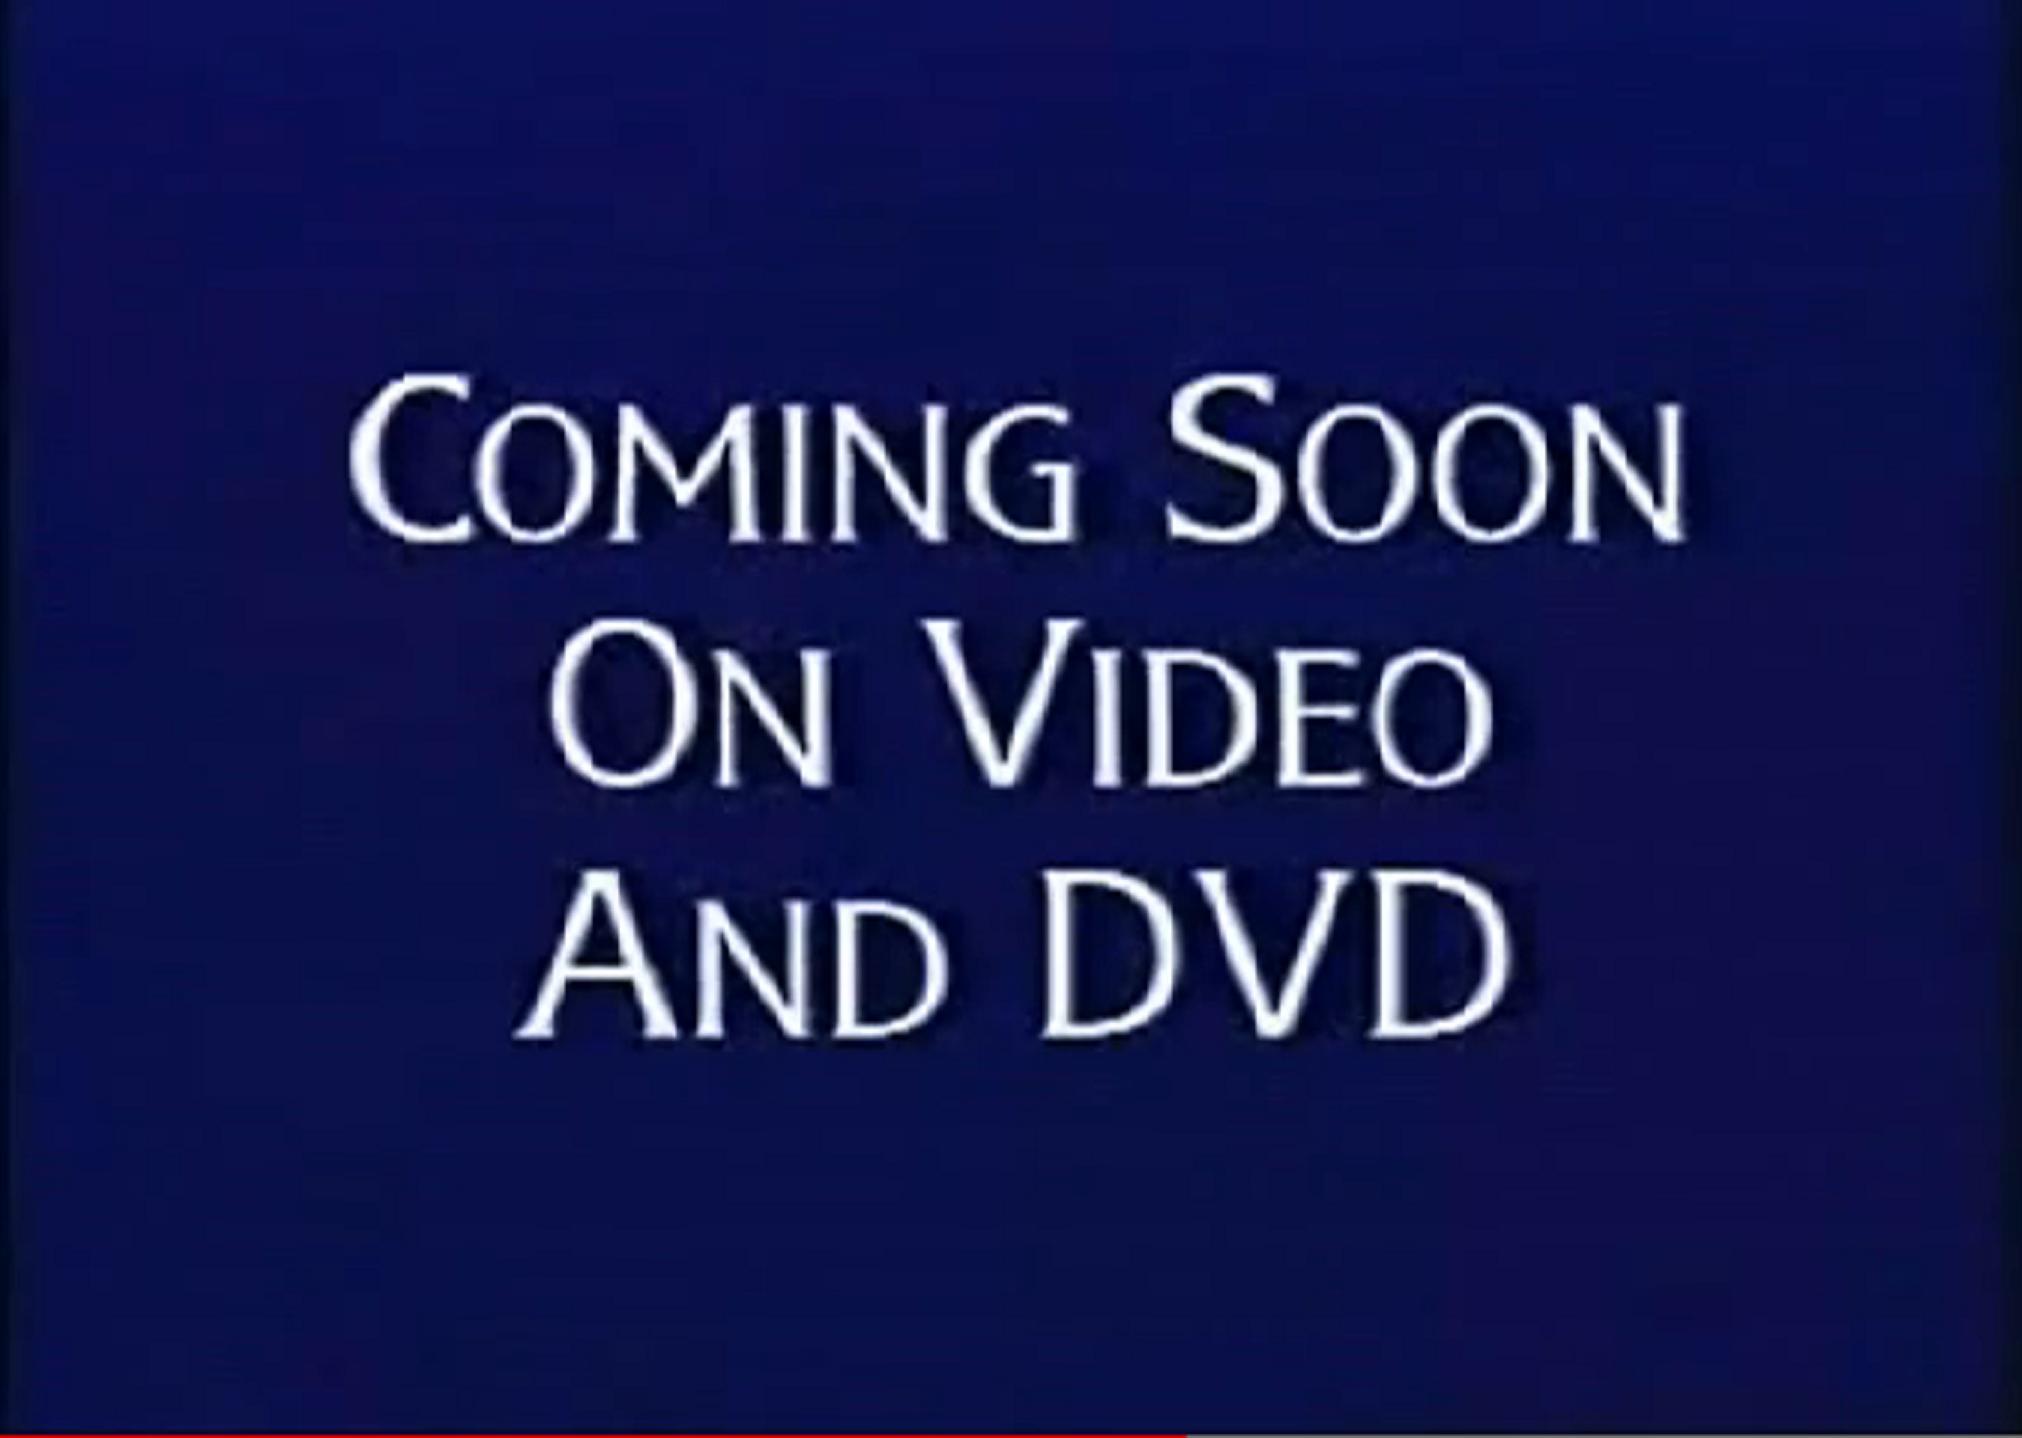 Walt Disney Studios Home Entertainment Buena Vista Coming Soon On Video & DVD Logo 1998